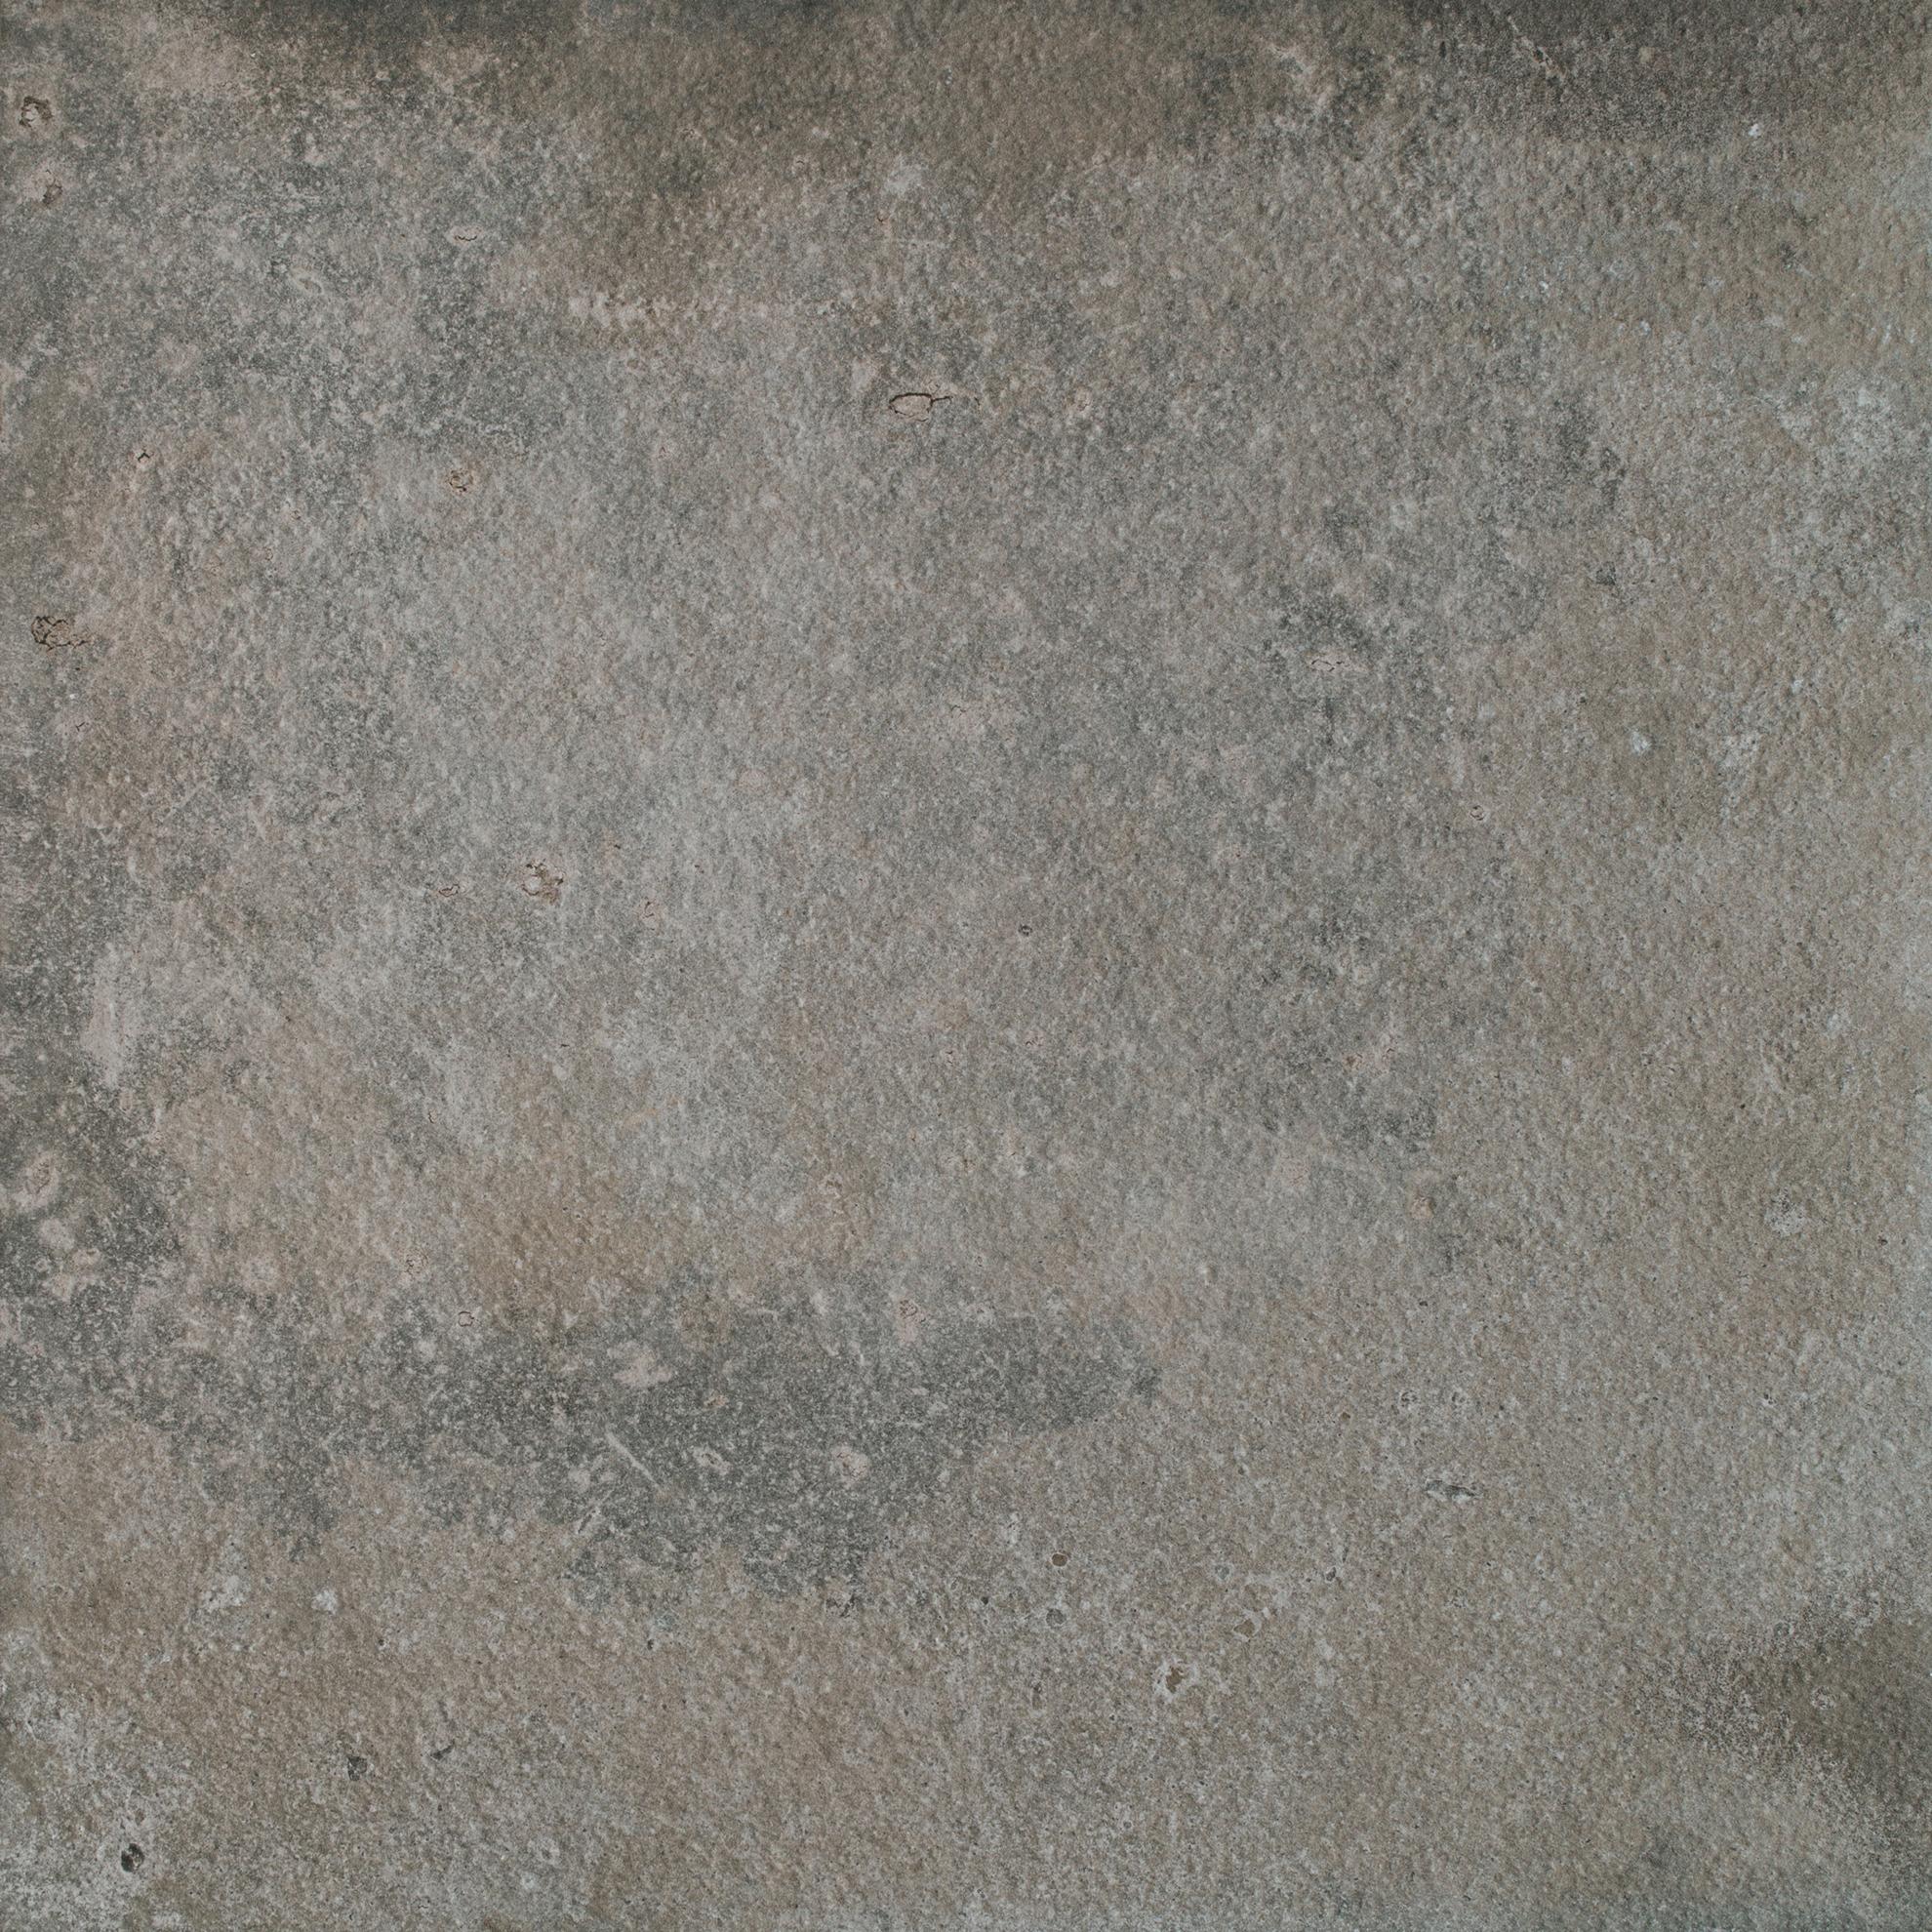 Imagine Tract Paving Dark Grey 60x60x2CM